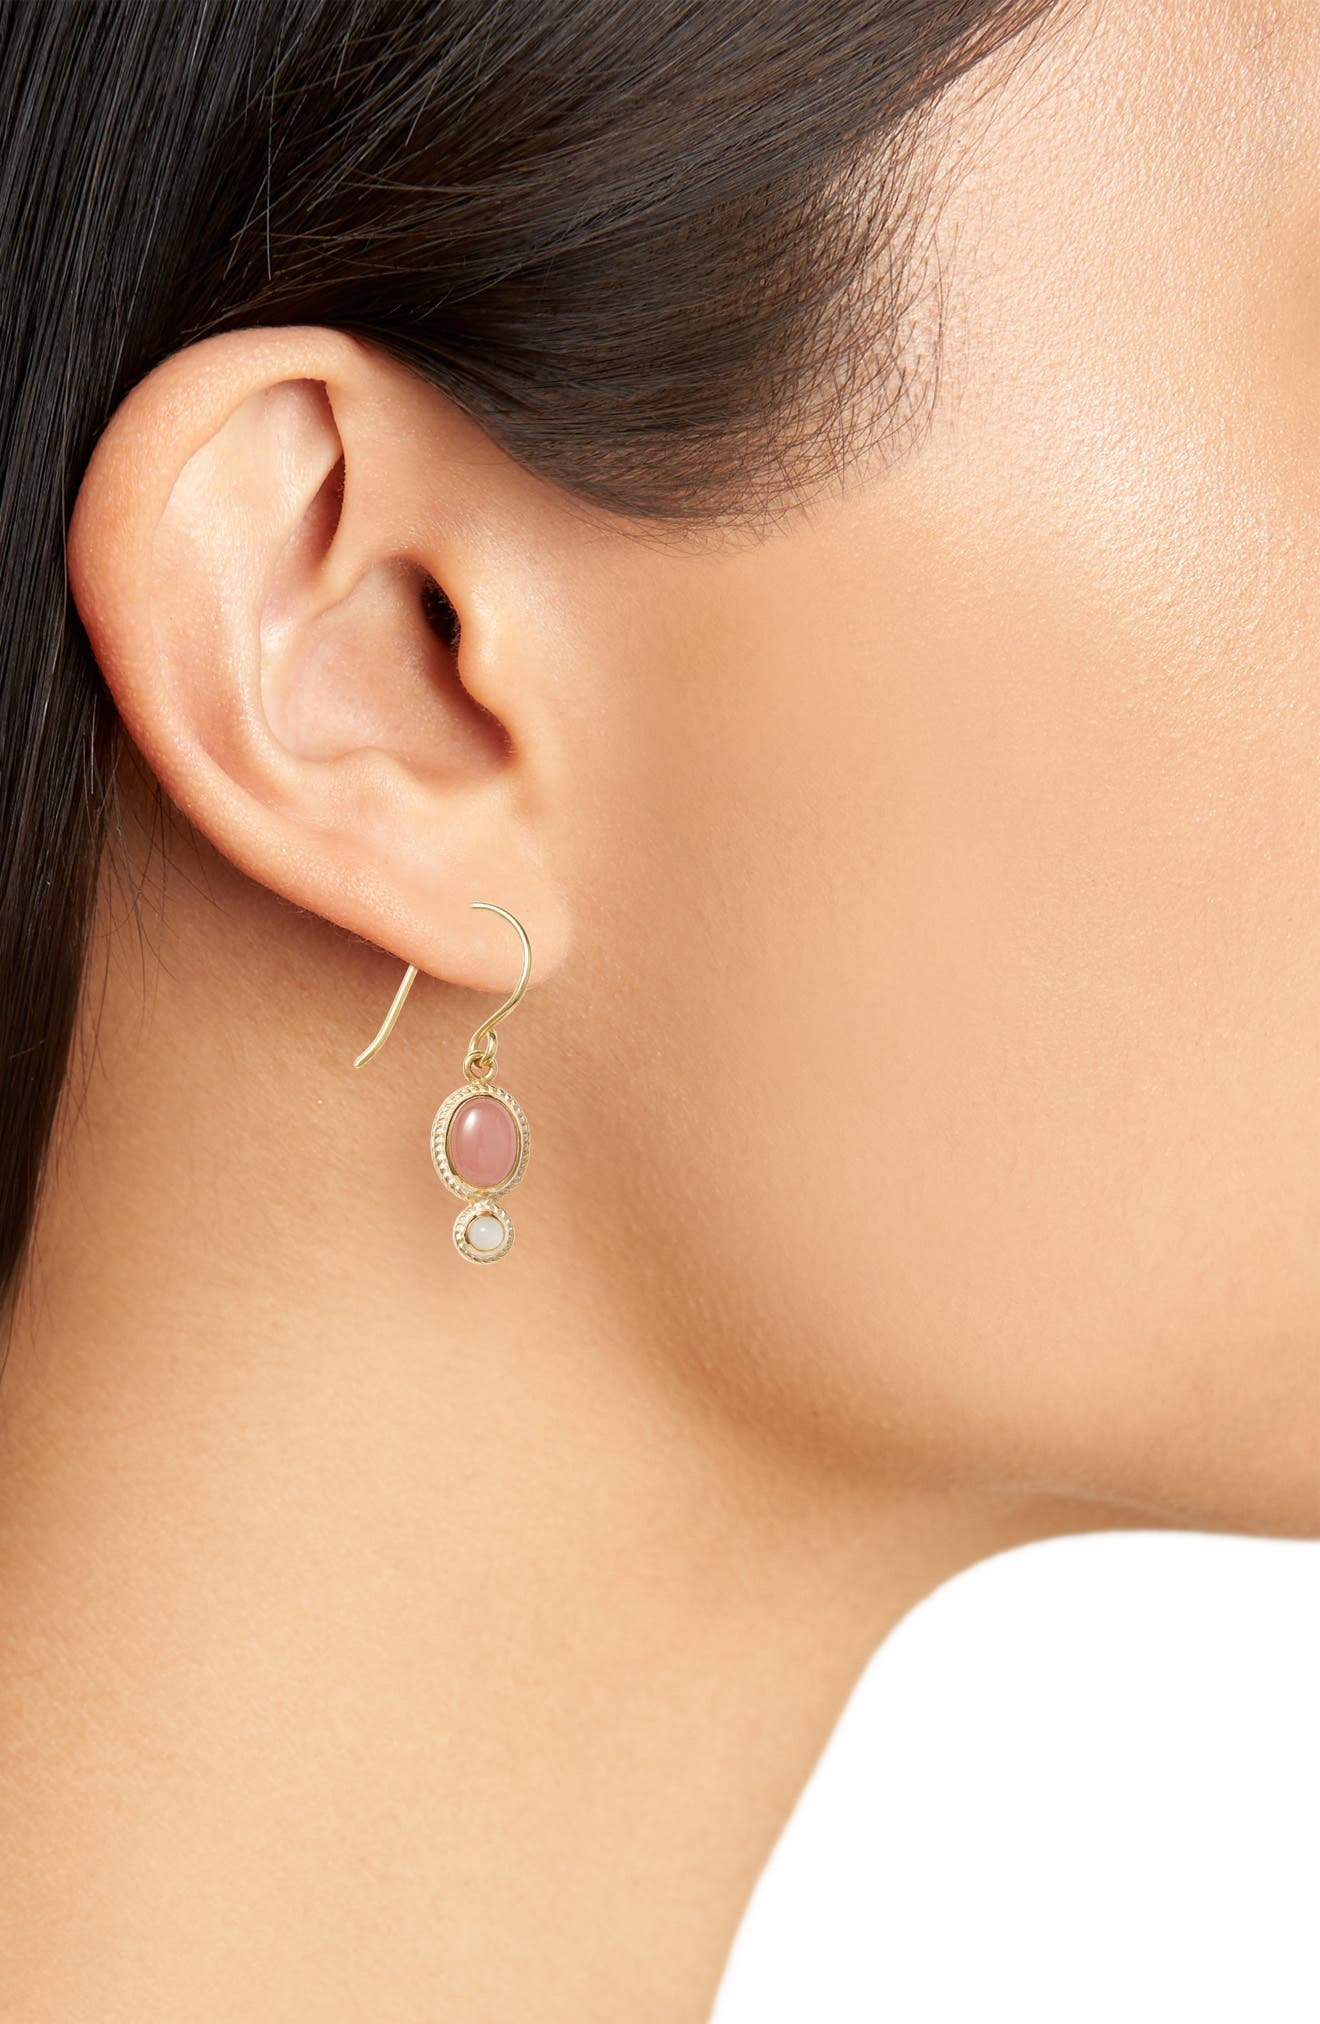 Guava Quartz & Moonstone Drop Earrings,                             Alternate thumbnail 3, color,                             950